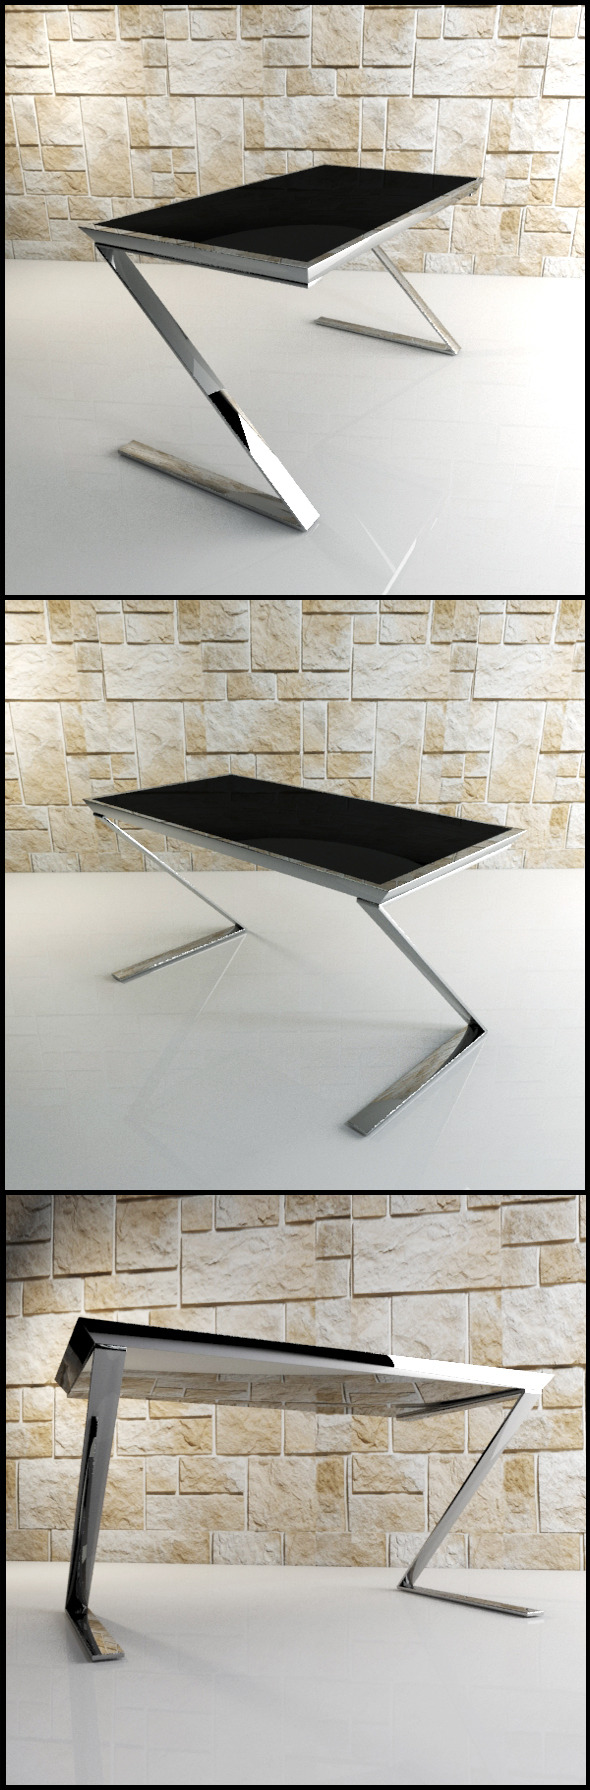 Z Desk: Black glass and chrome office desk. - 3DOcean Item for Sale